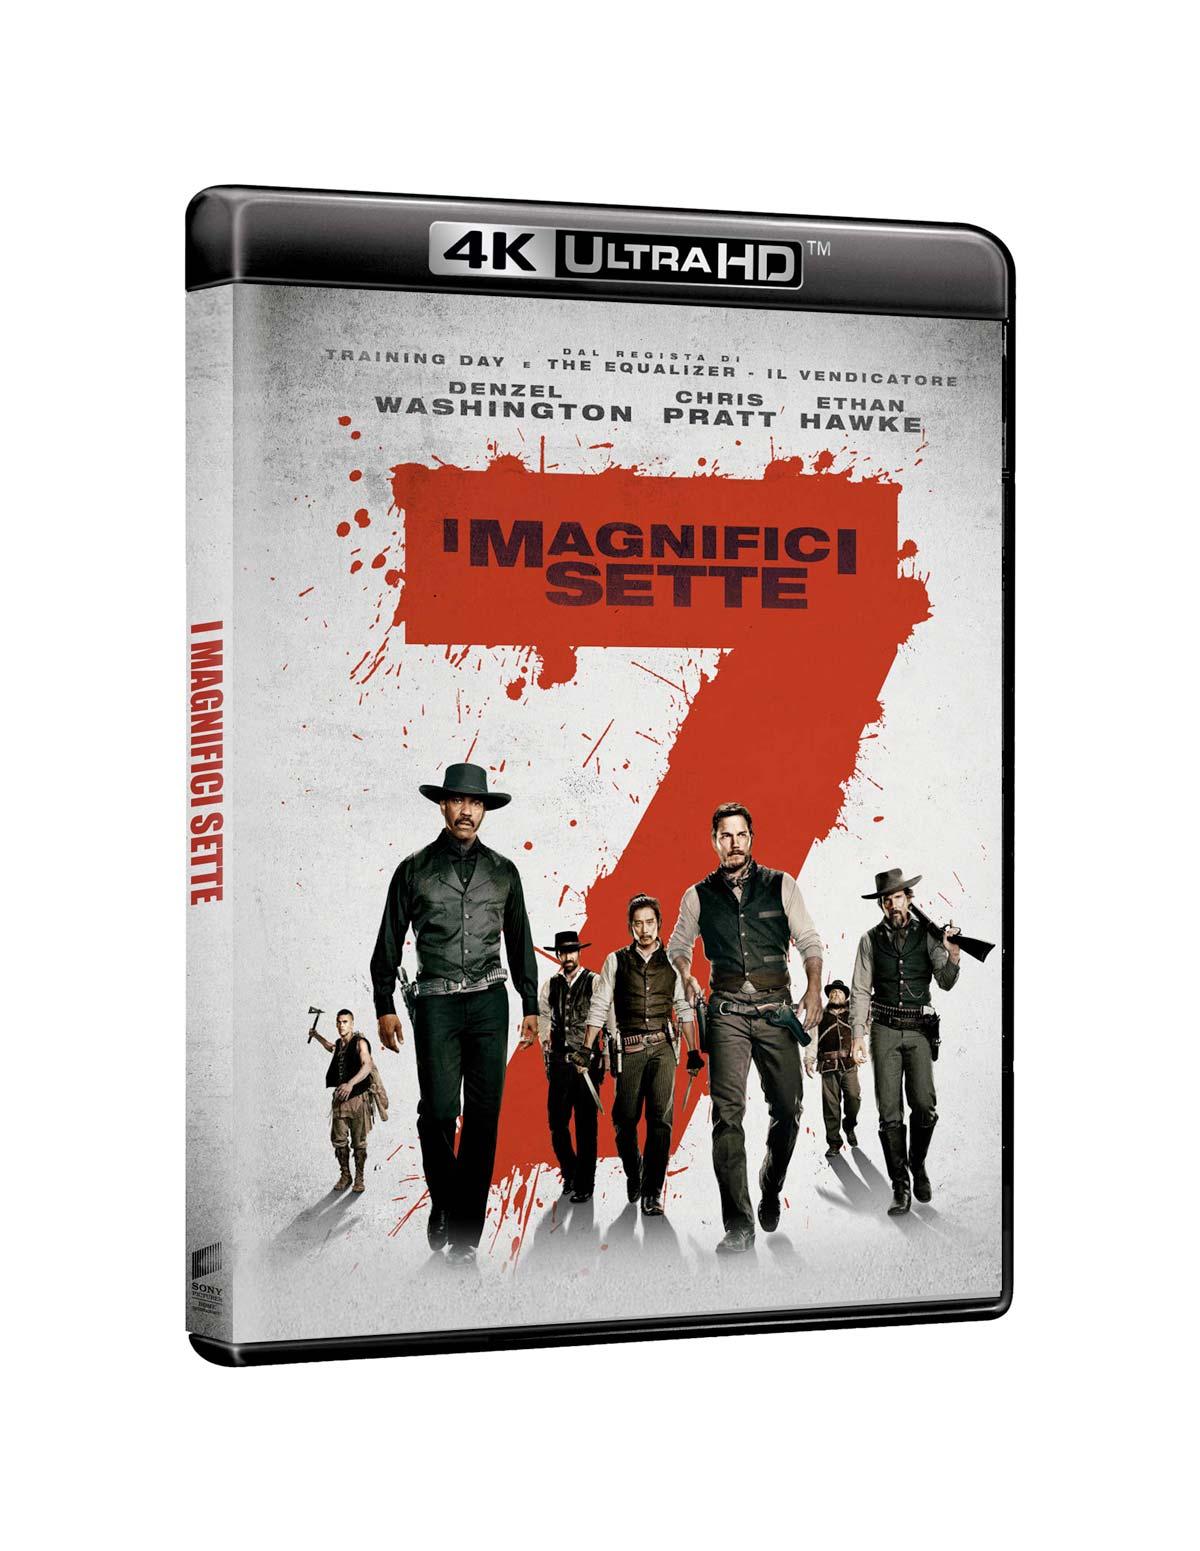 I MAGNIFICI SETTE (2016) -(BLU-RAY 4K ULTRA HD+BLU-RAY)